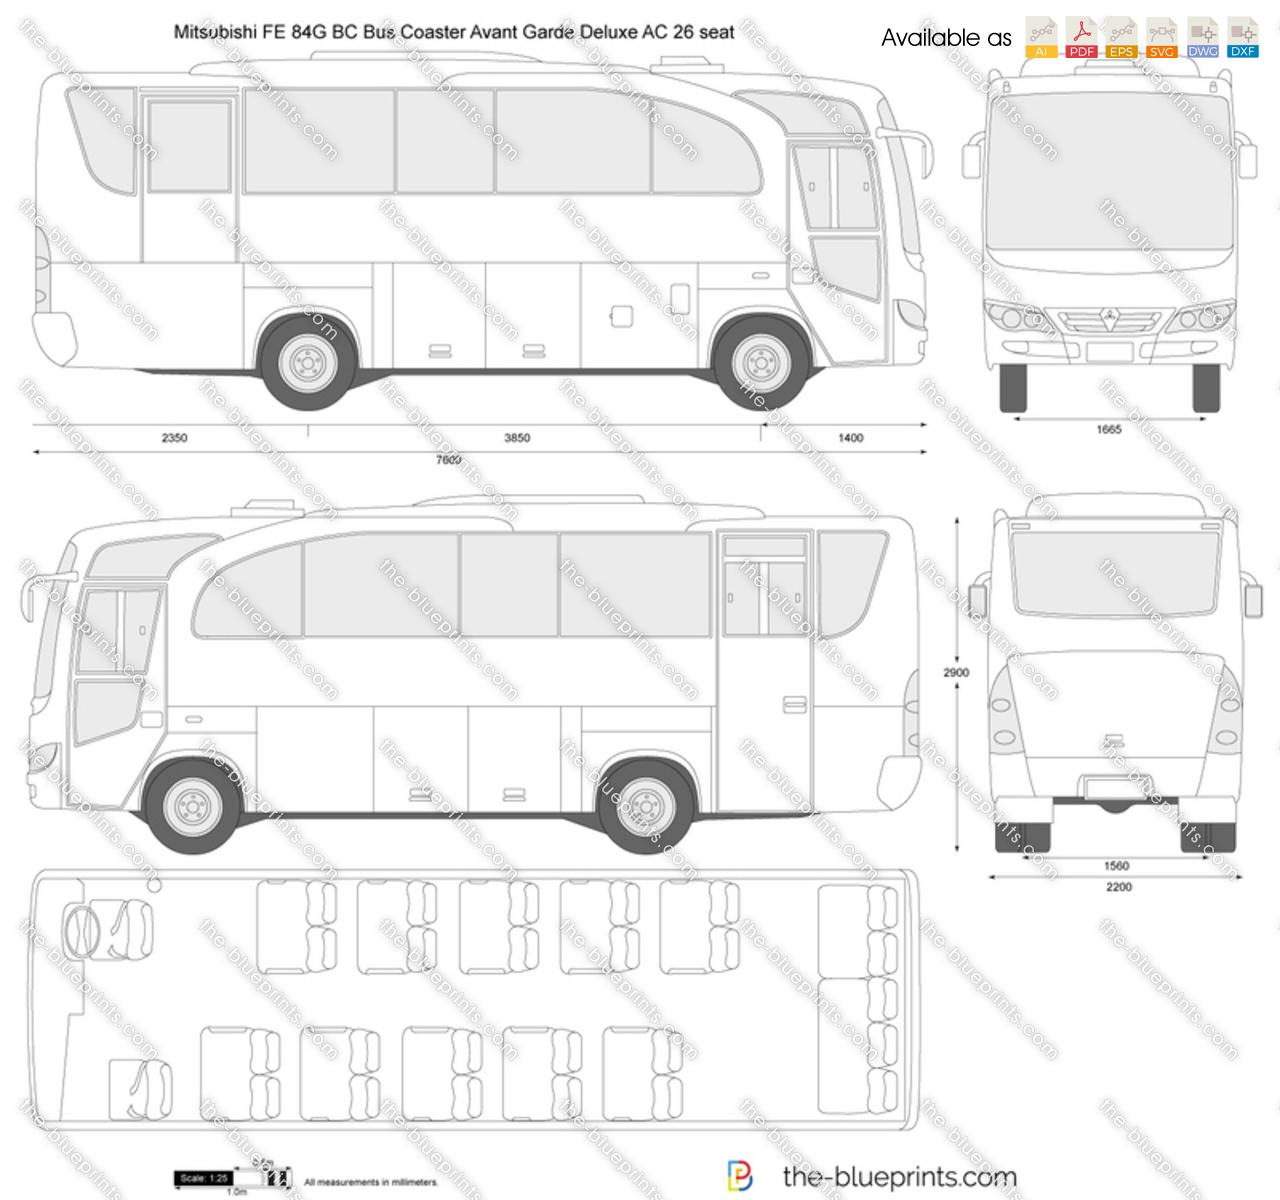 Mitsubishi FE 84G BC Bus Coaster Avant Garde Deluxe AC 26 seat